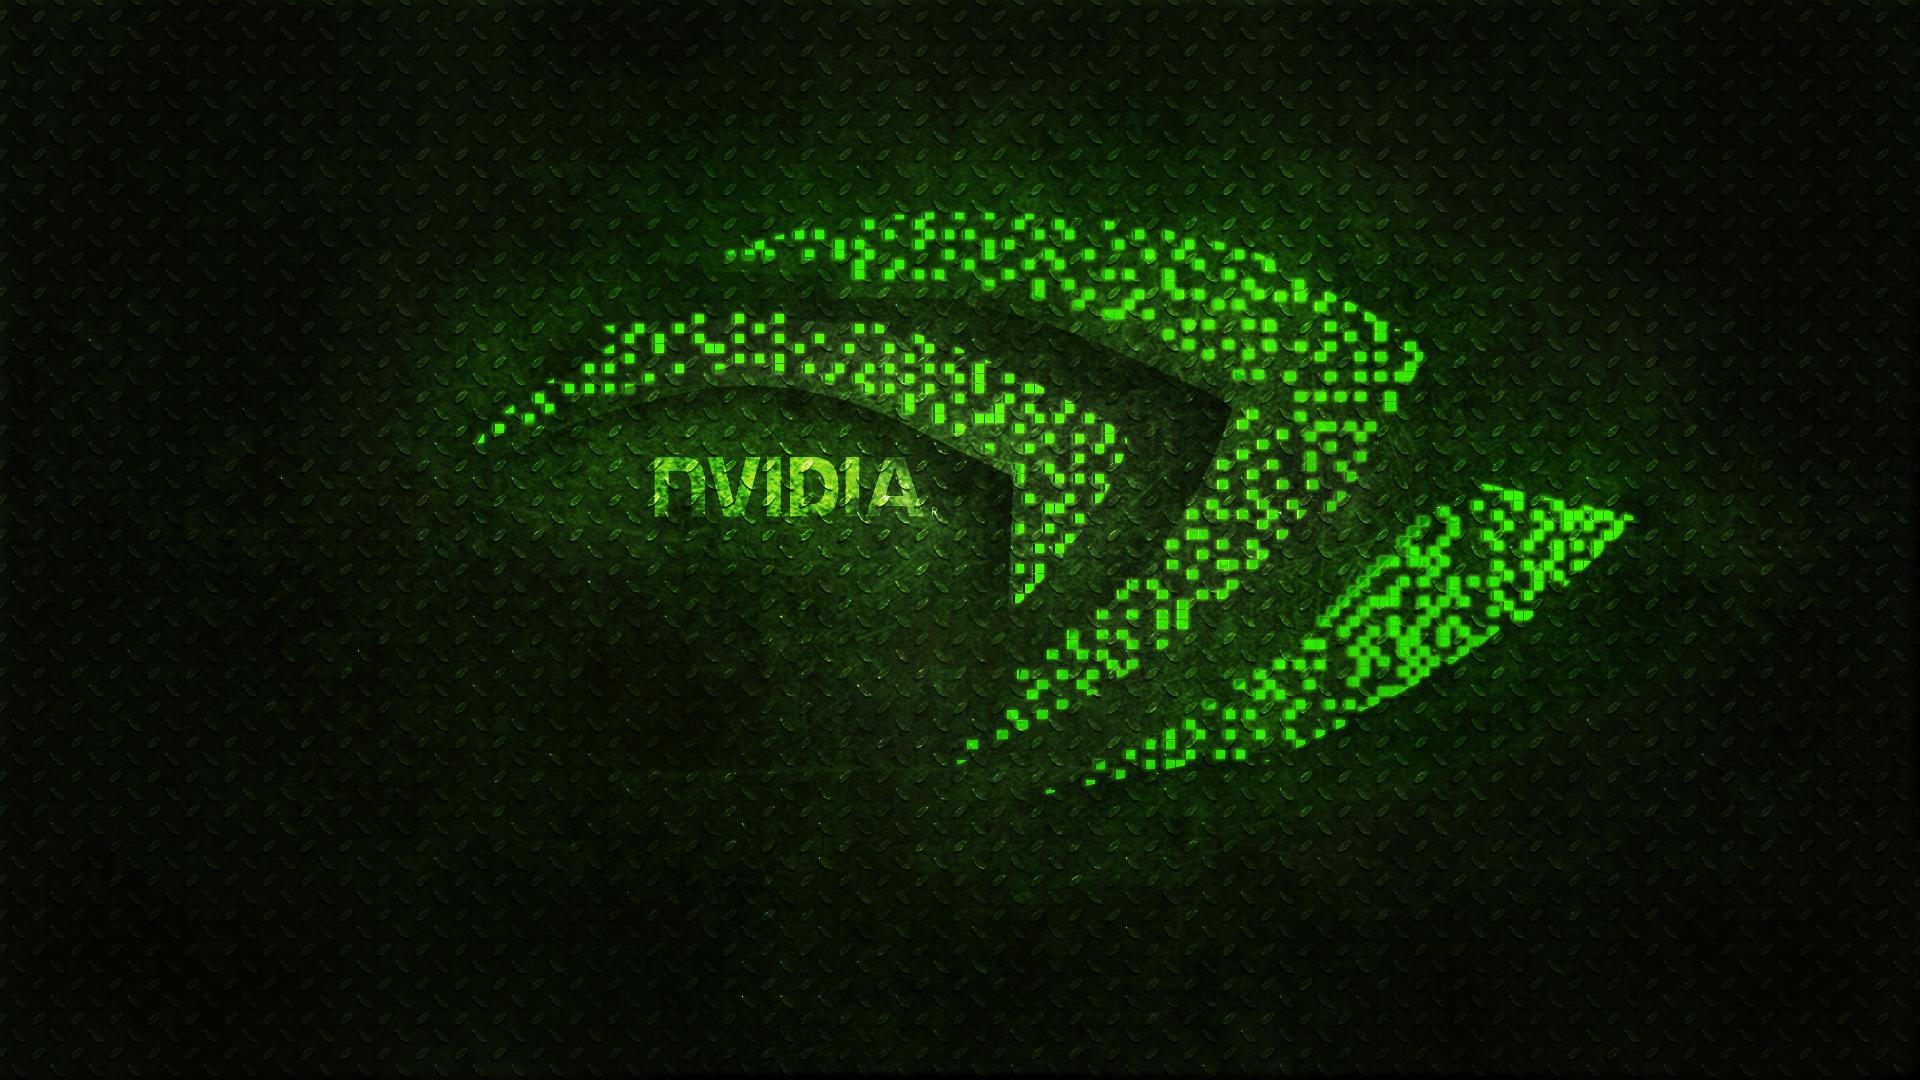 Nvidia 4k desktop wallpapers top free nvidia 4k desktop - 1920x1080 wallpaper nvidia ...